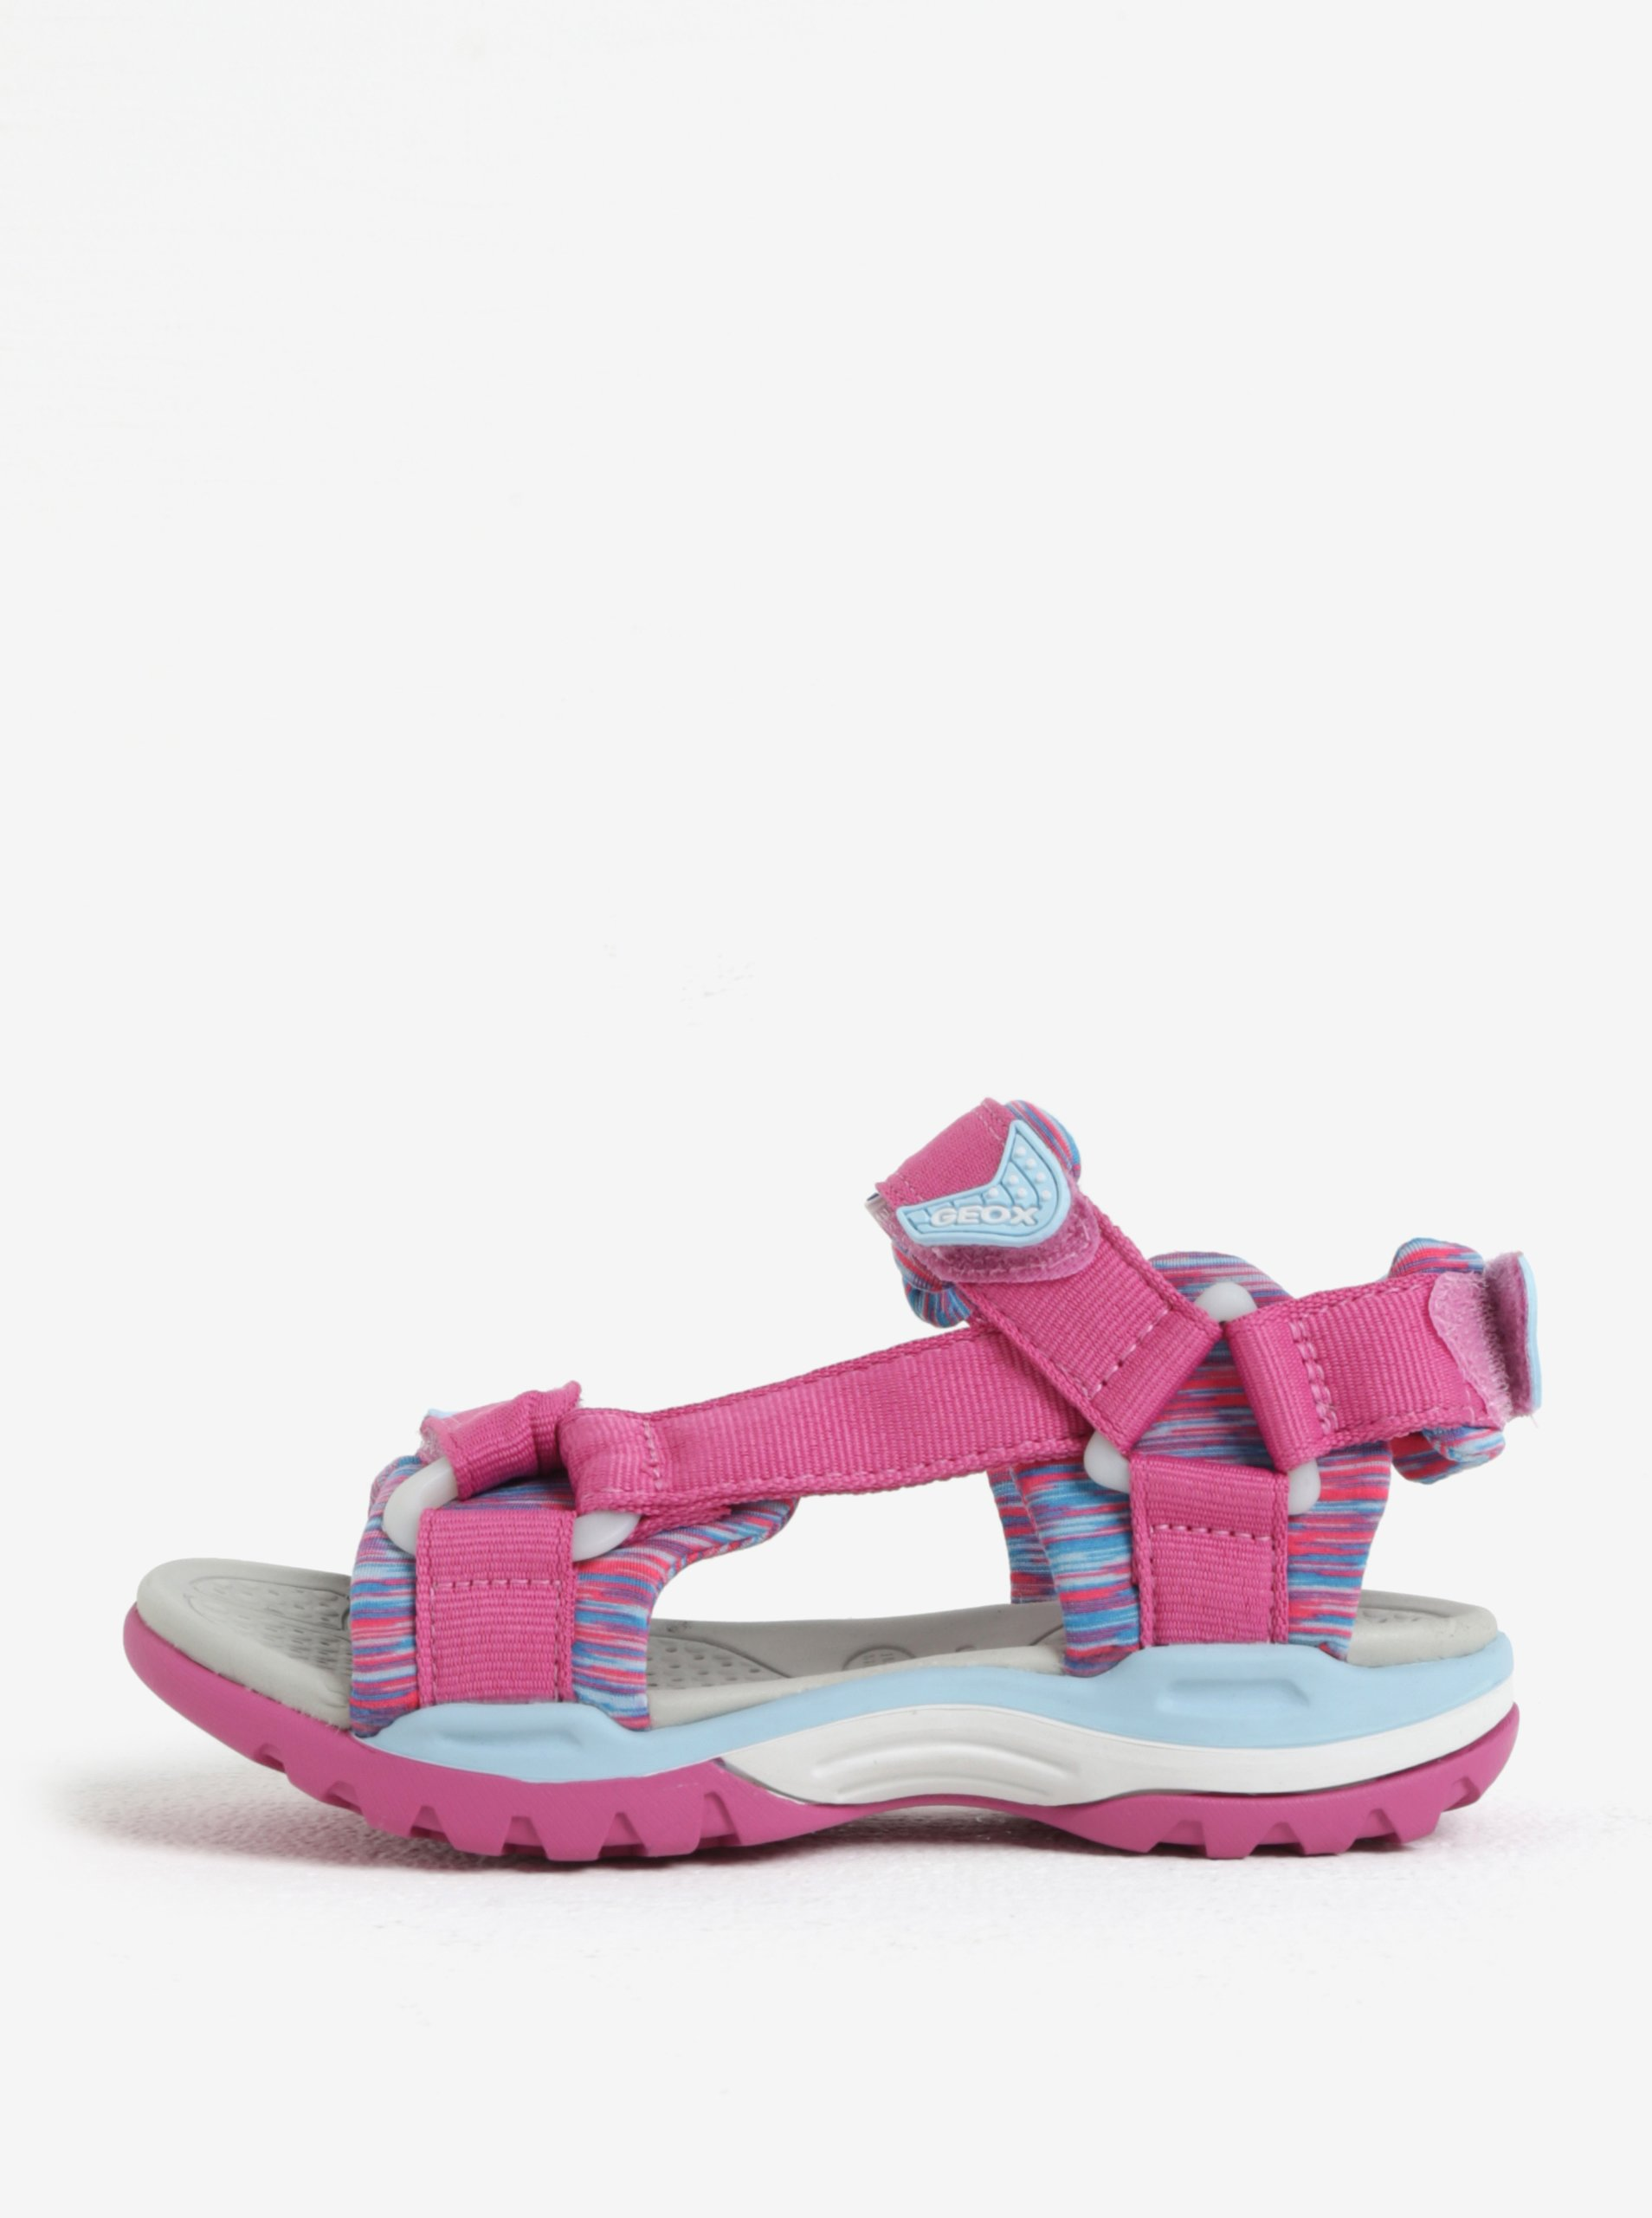 0b1a689bc642 Modro-ružové dievčenské sandále Geox Borealis